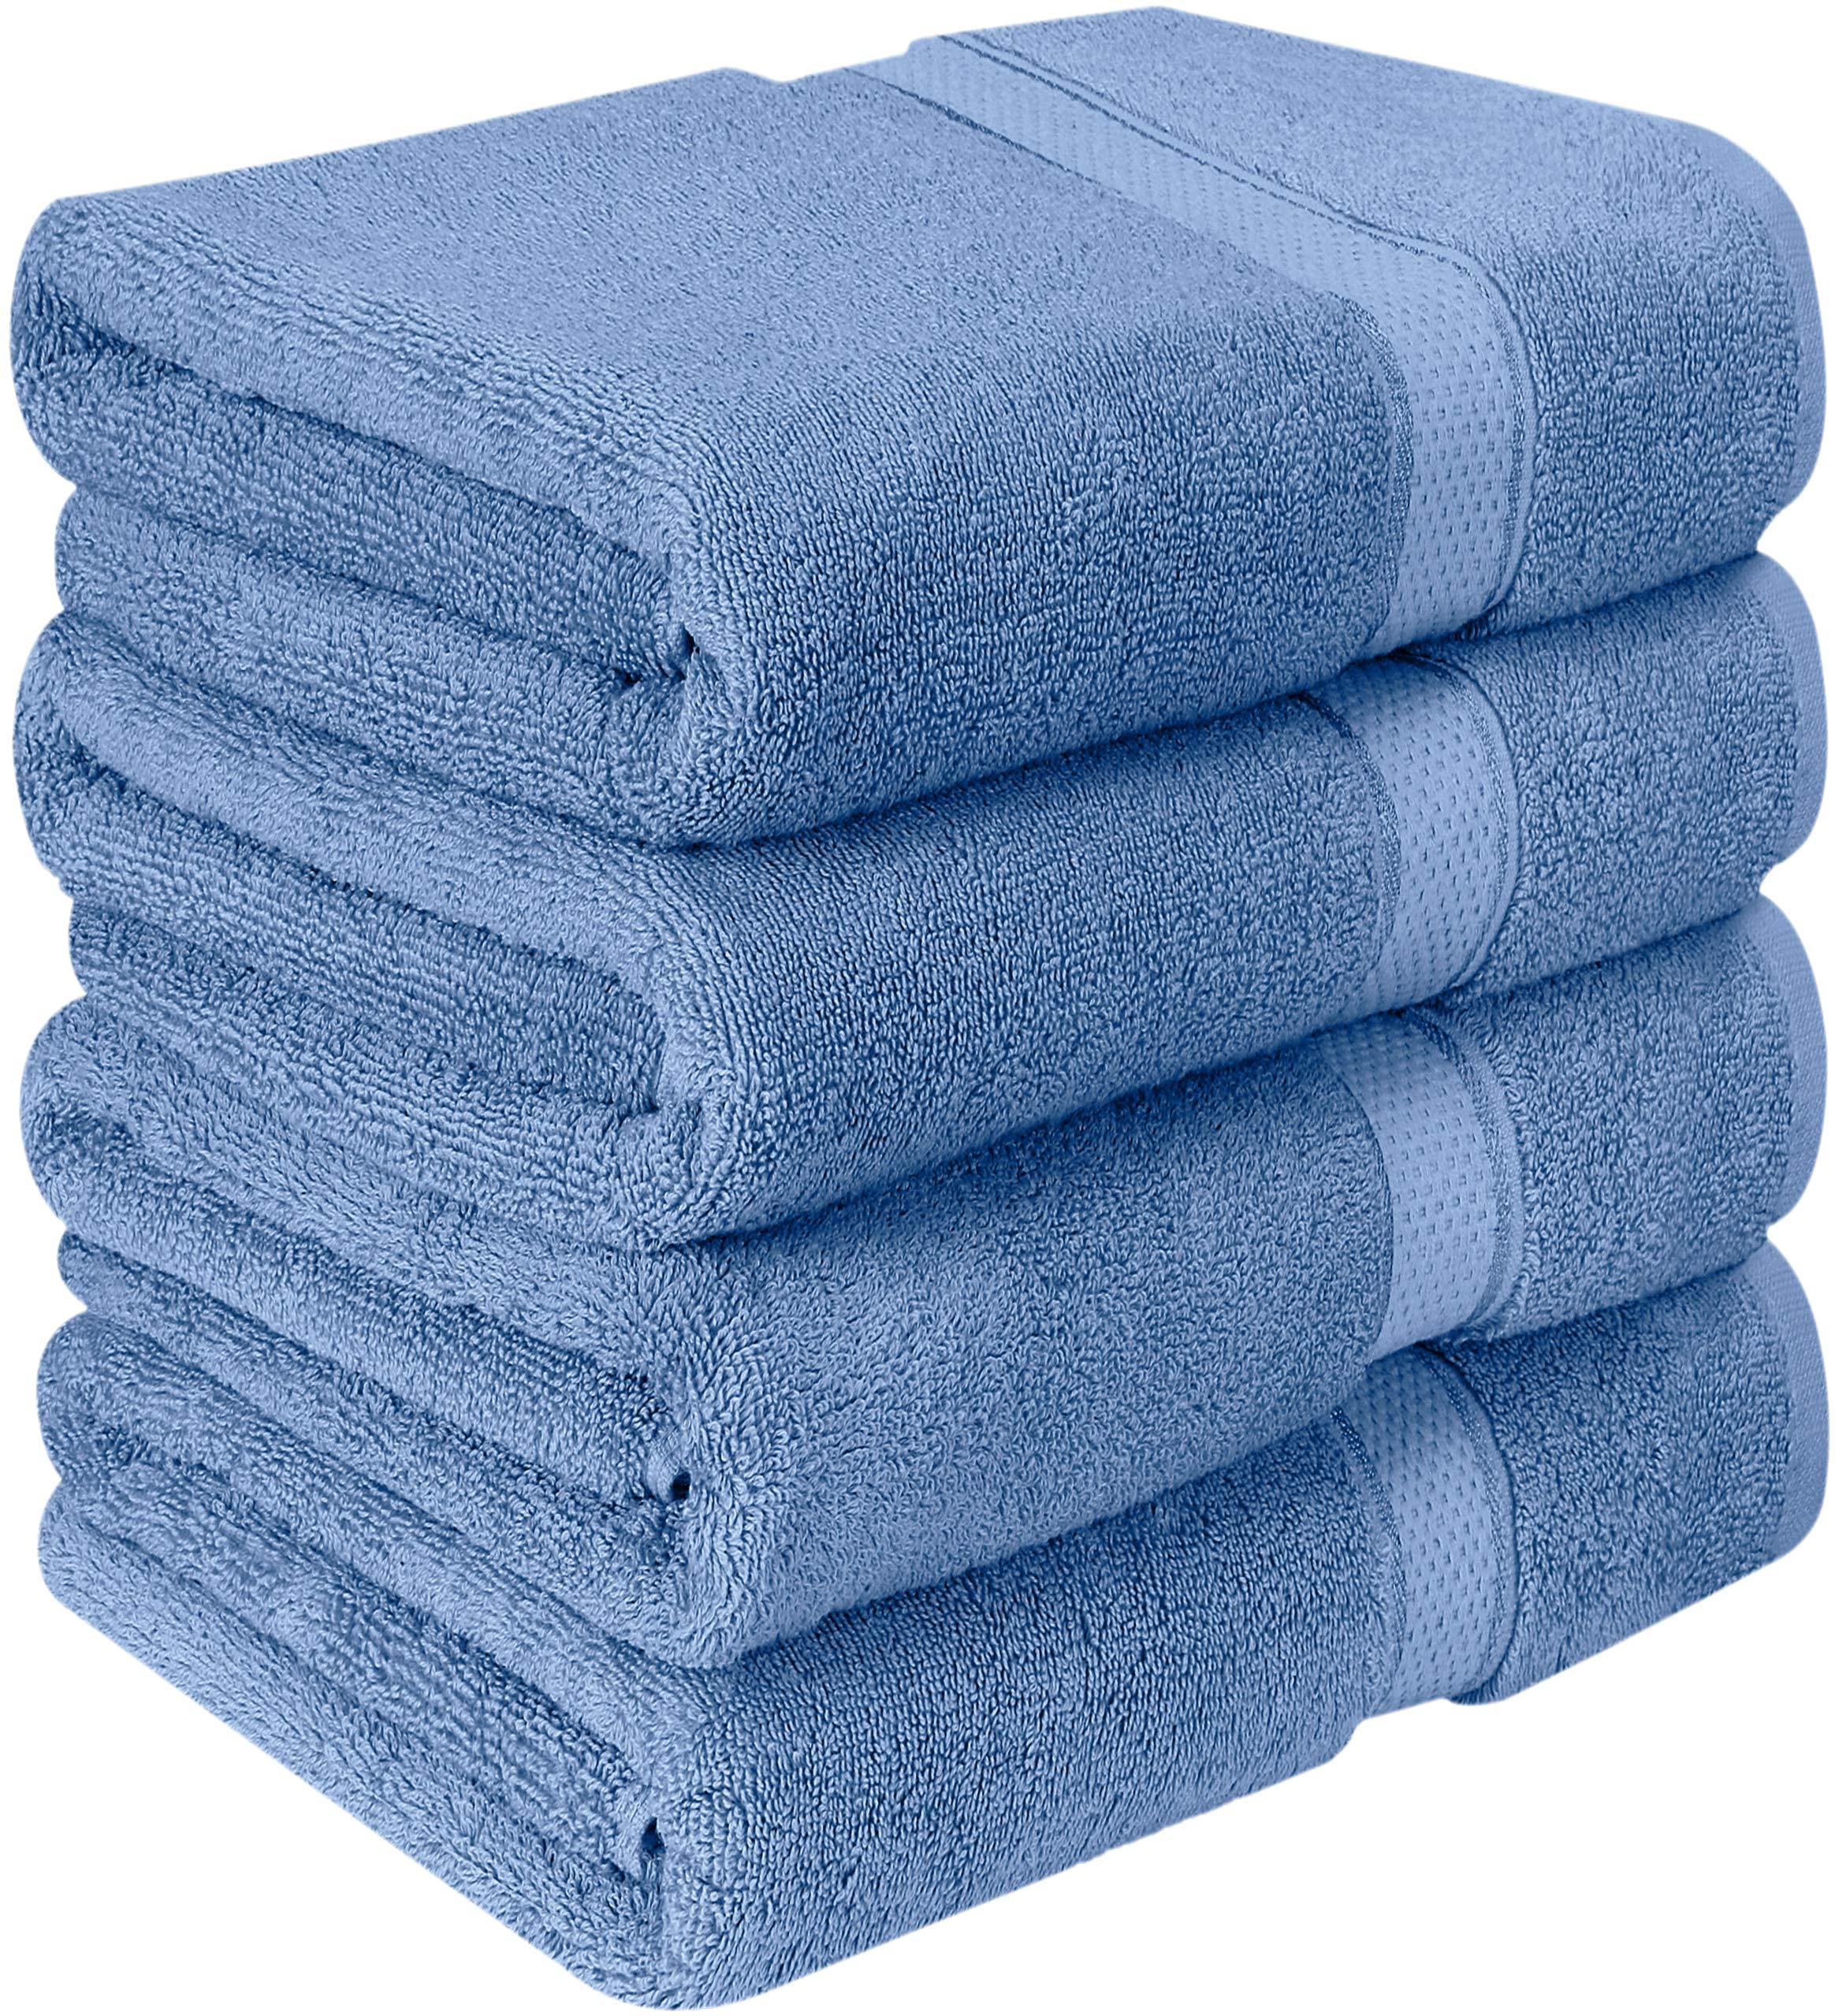 Utopia Towels Luxurious Bath Towels, 4 Pack, Wedgewood